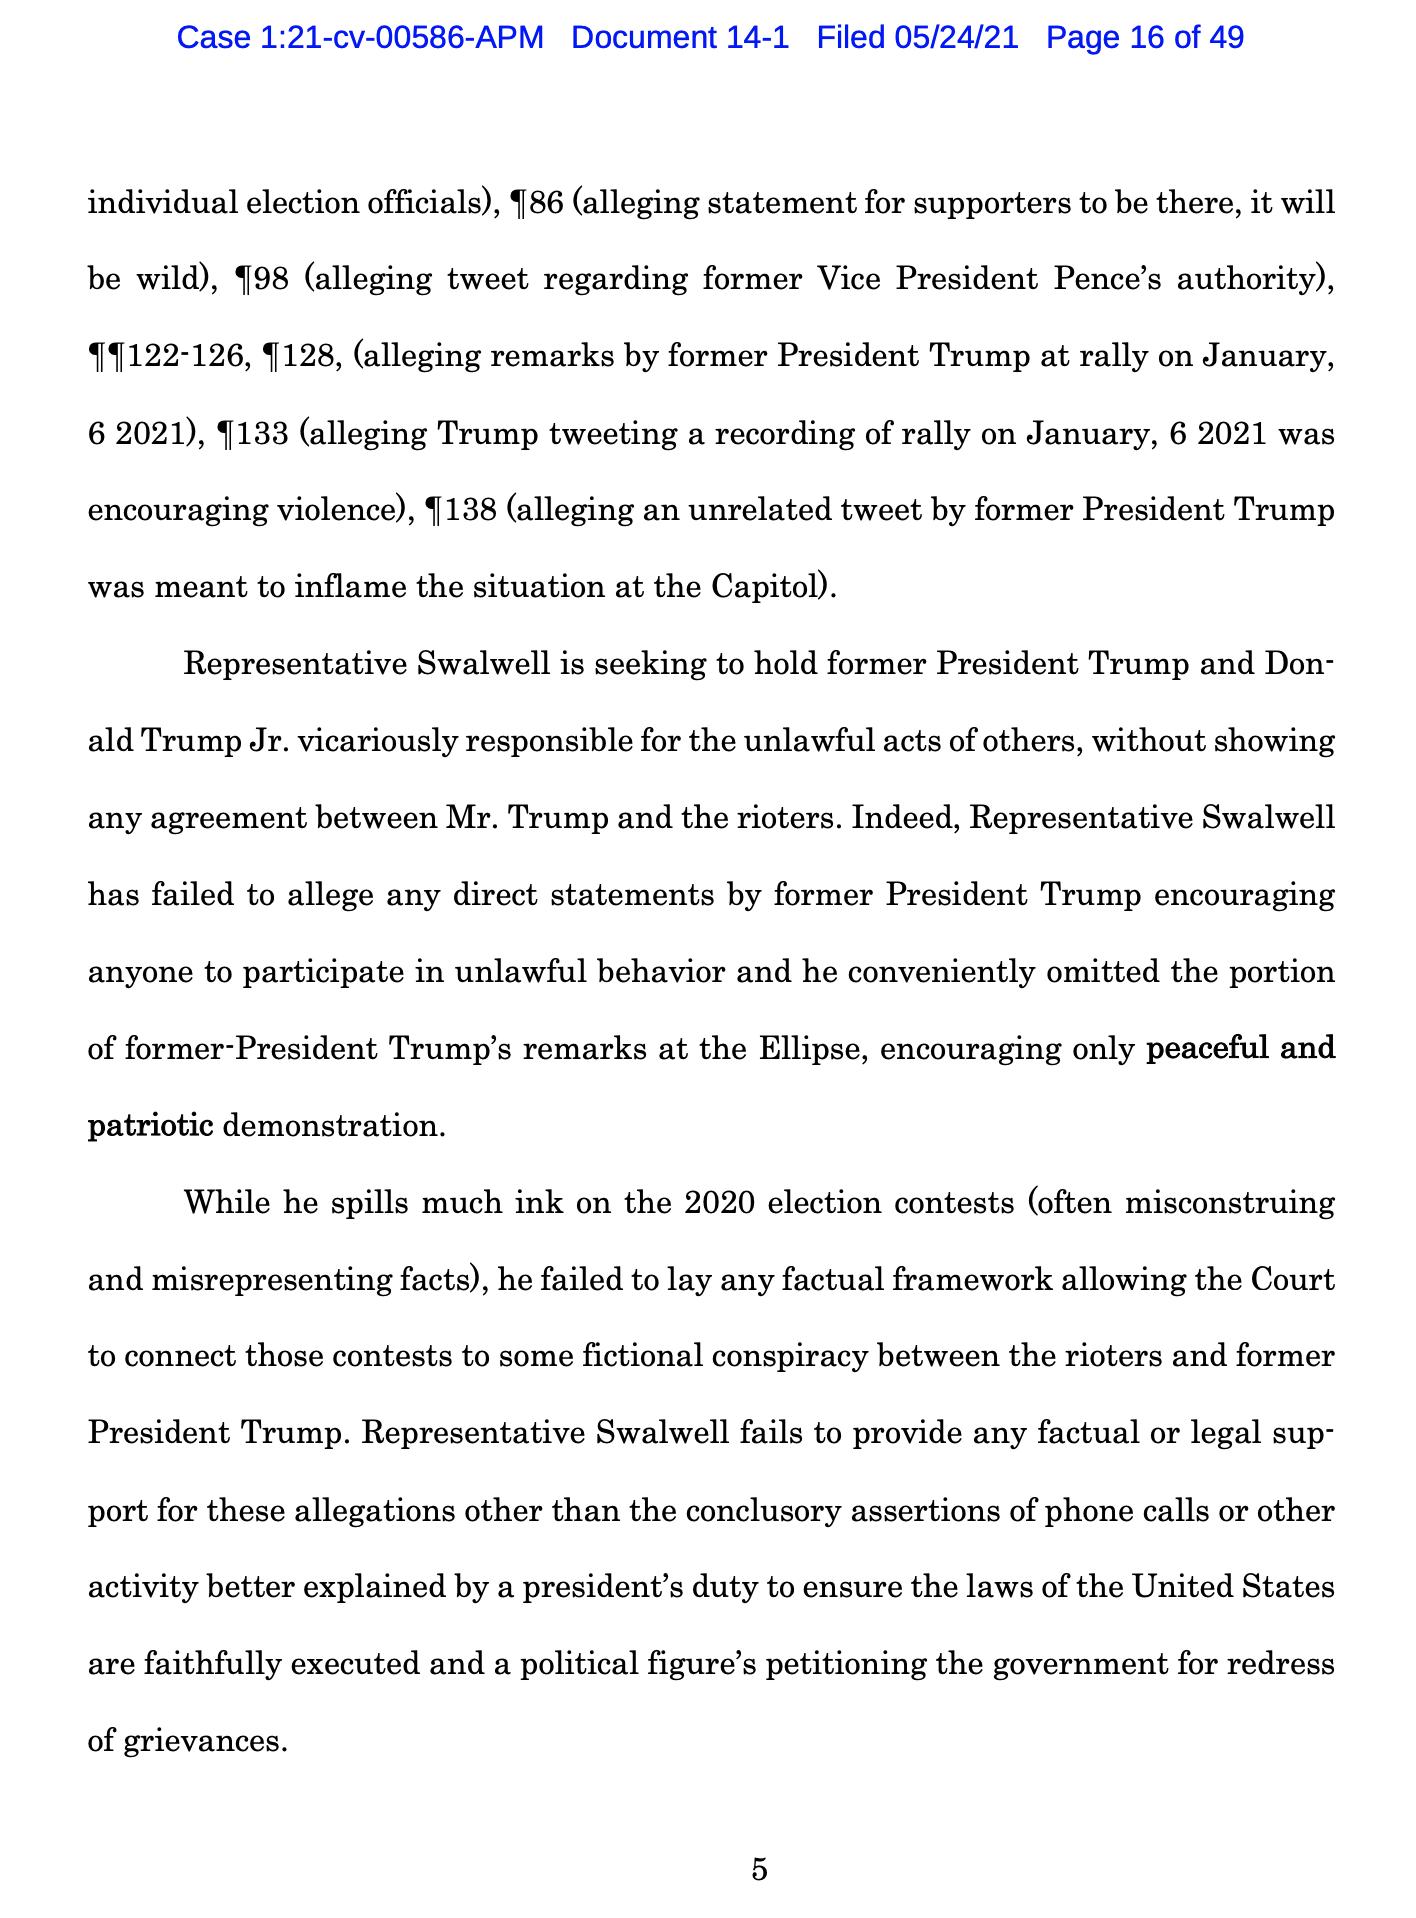 Screen-Shot-2021-05-25-at-9.49.34-AM Trump Declares Full Immunity From Jan. 6 Insurrection Lawsuit Crime Donald Trump Featured Politics Top Stories